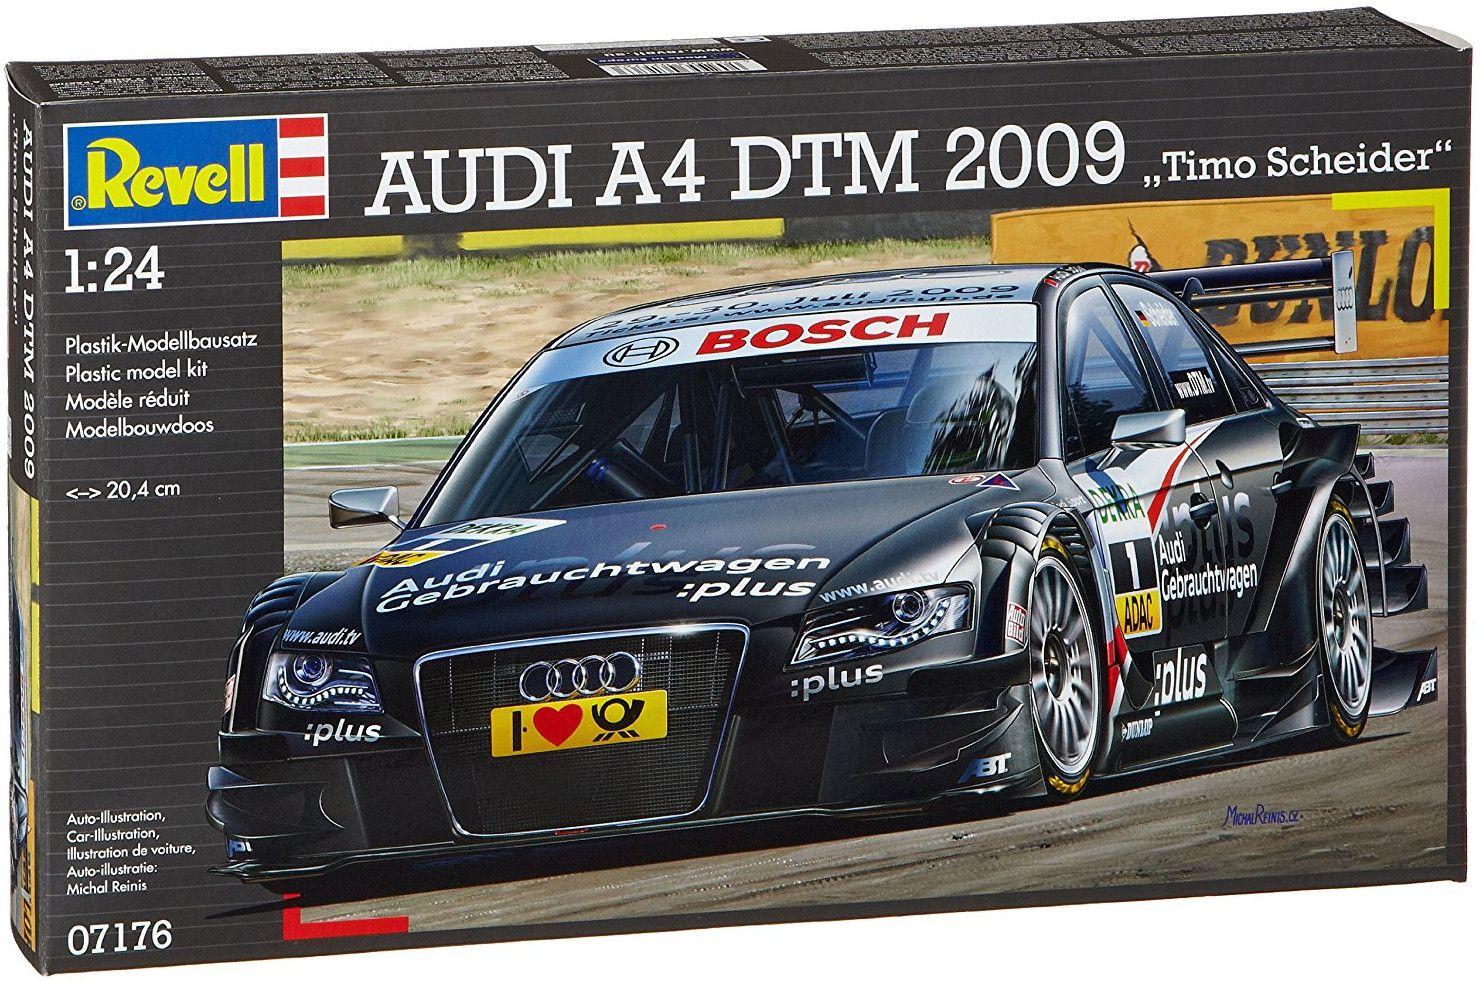 Сглобяем модел на автомобил Revell - Audi A4 2009 Timo Scheider (07176) - 2